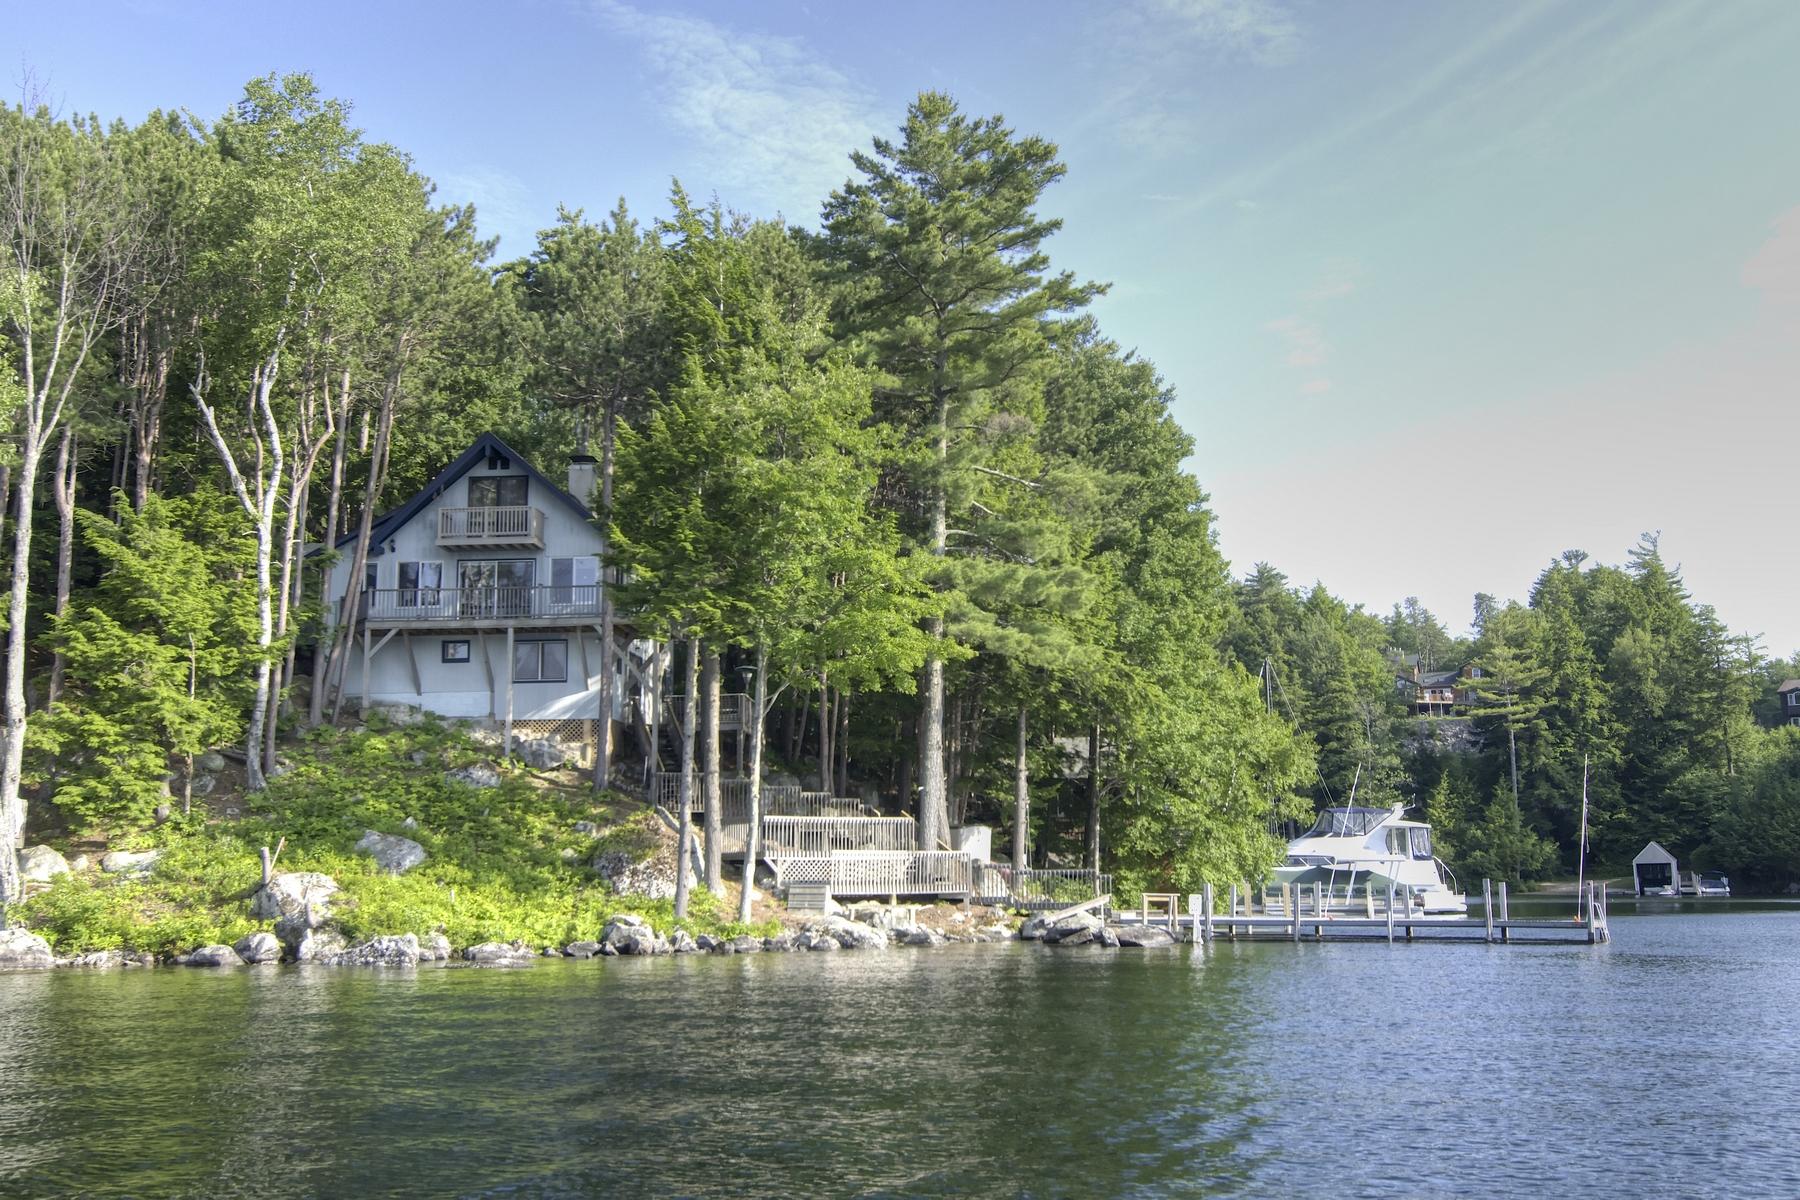 Single Family Home for Sale at 14 Mill Cove Road, Alton 14 Mill Cove Rd Alton, New Hampshire 03809 United States